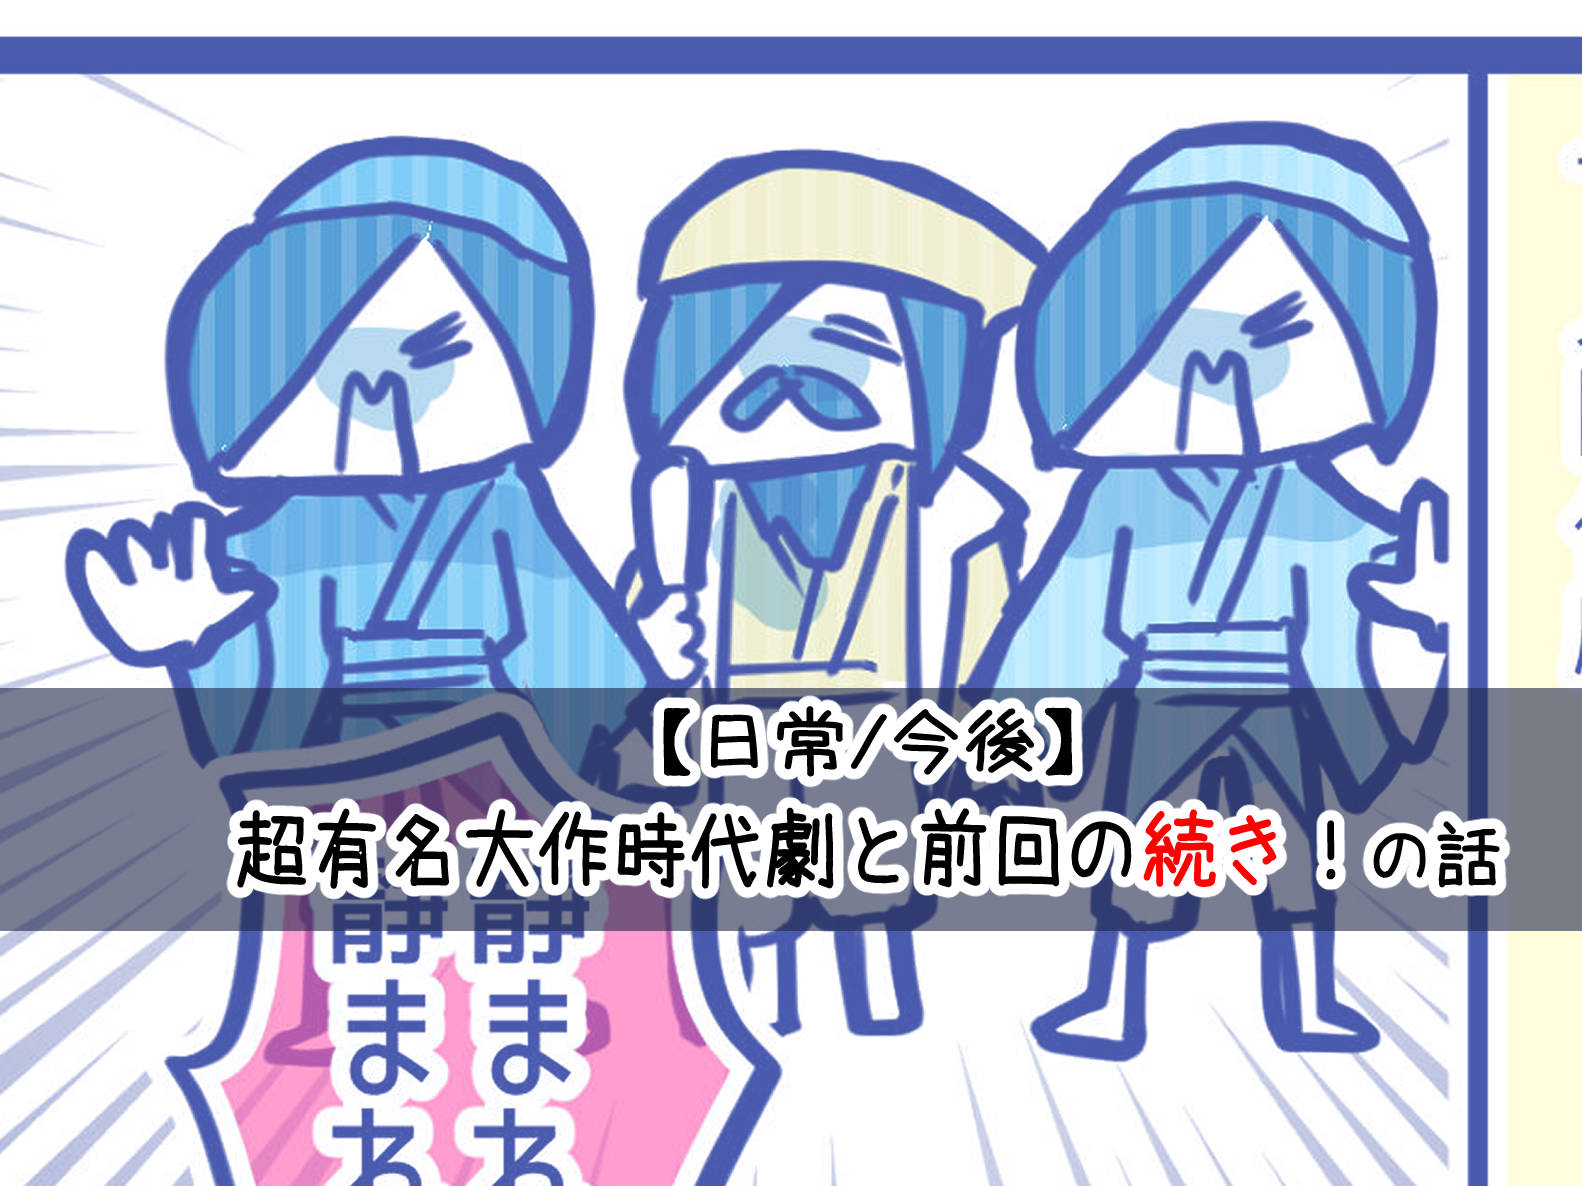 neetsadami.com_16話サムネ